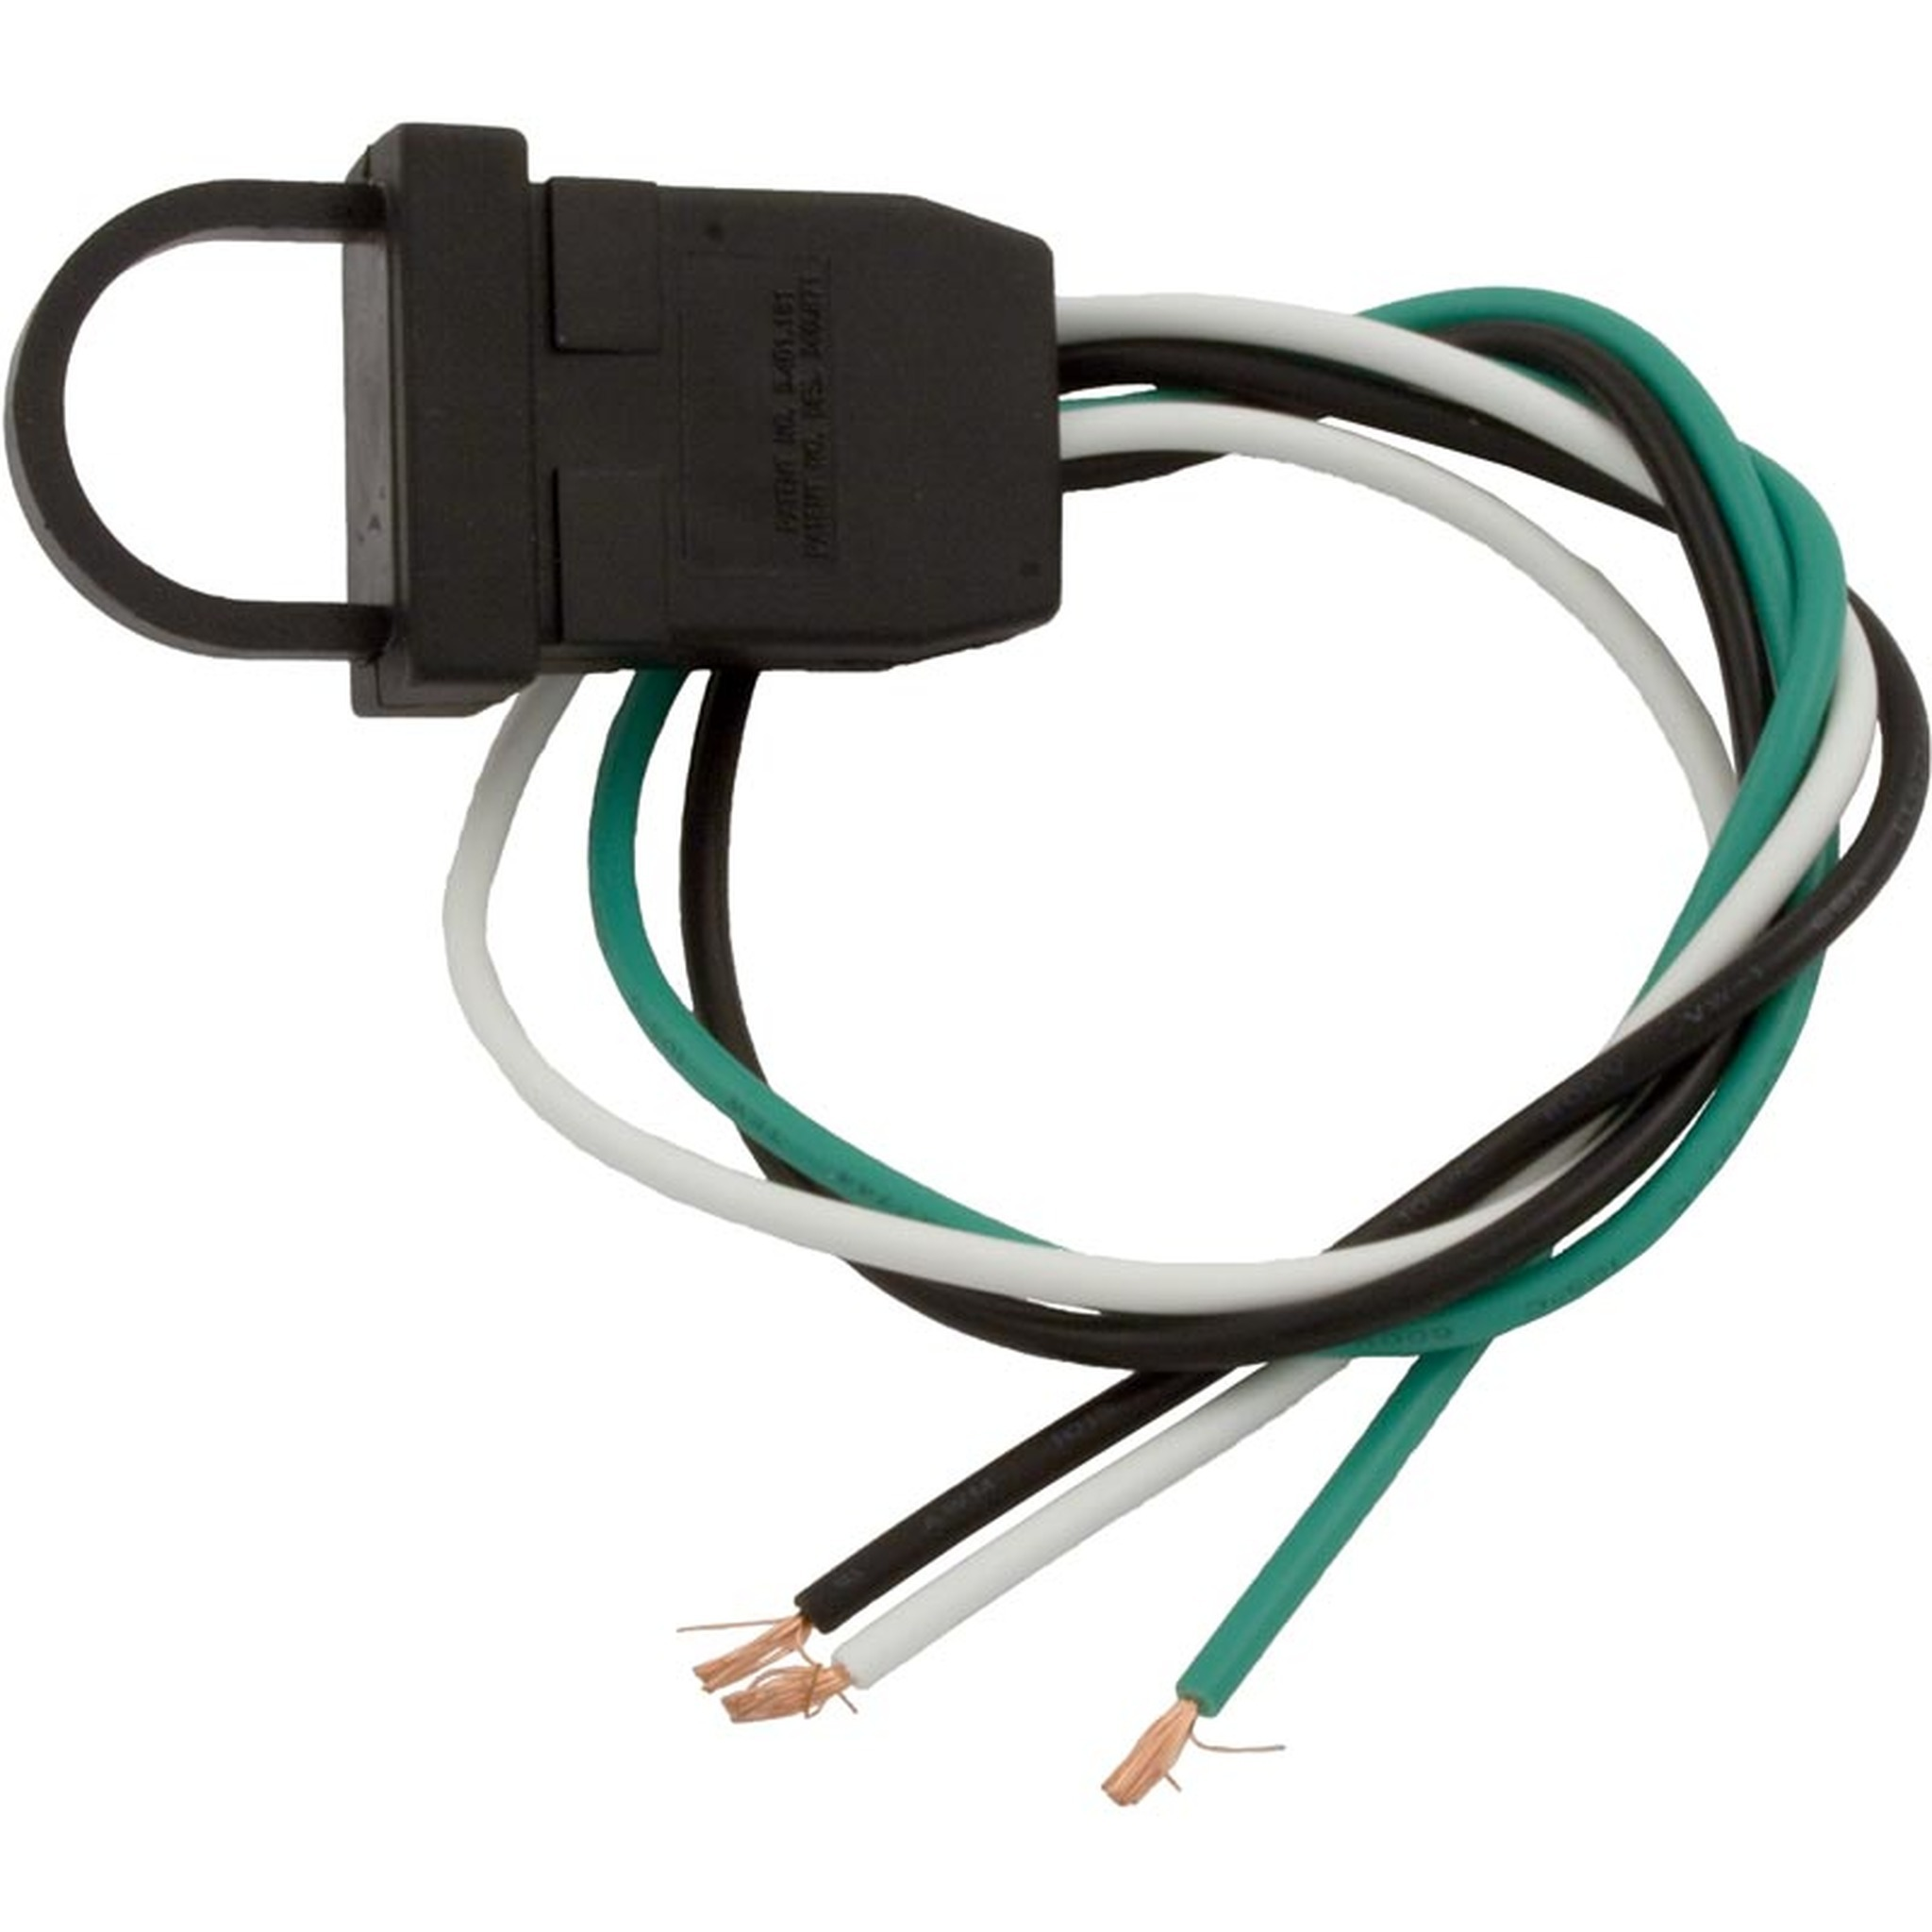 J&J Molded Receptacles, Plugs & Cords